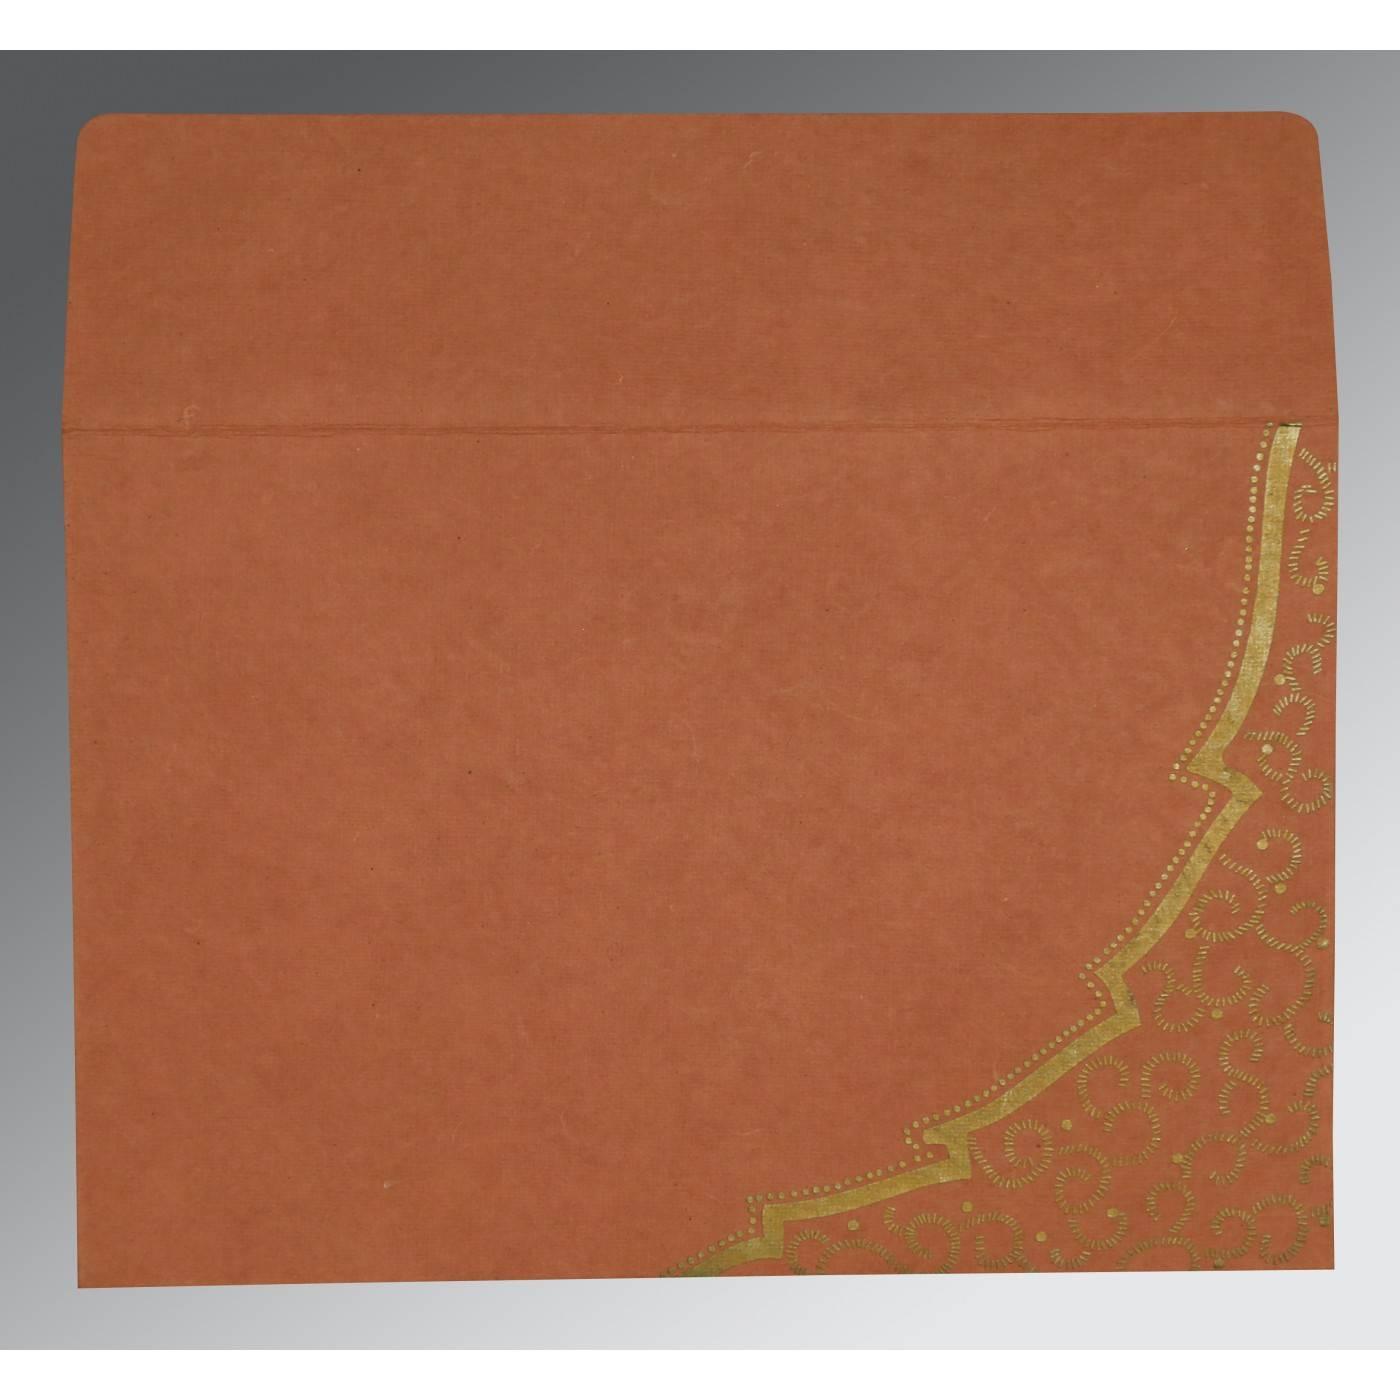 BURNT ORANGE HANDMADE COTTON FLORAL THEMED - FOIL STAMPED WEDDING CARD : CRU-8219M - IndianWeddingCards